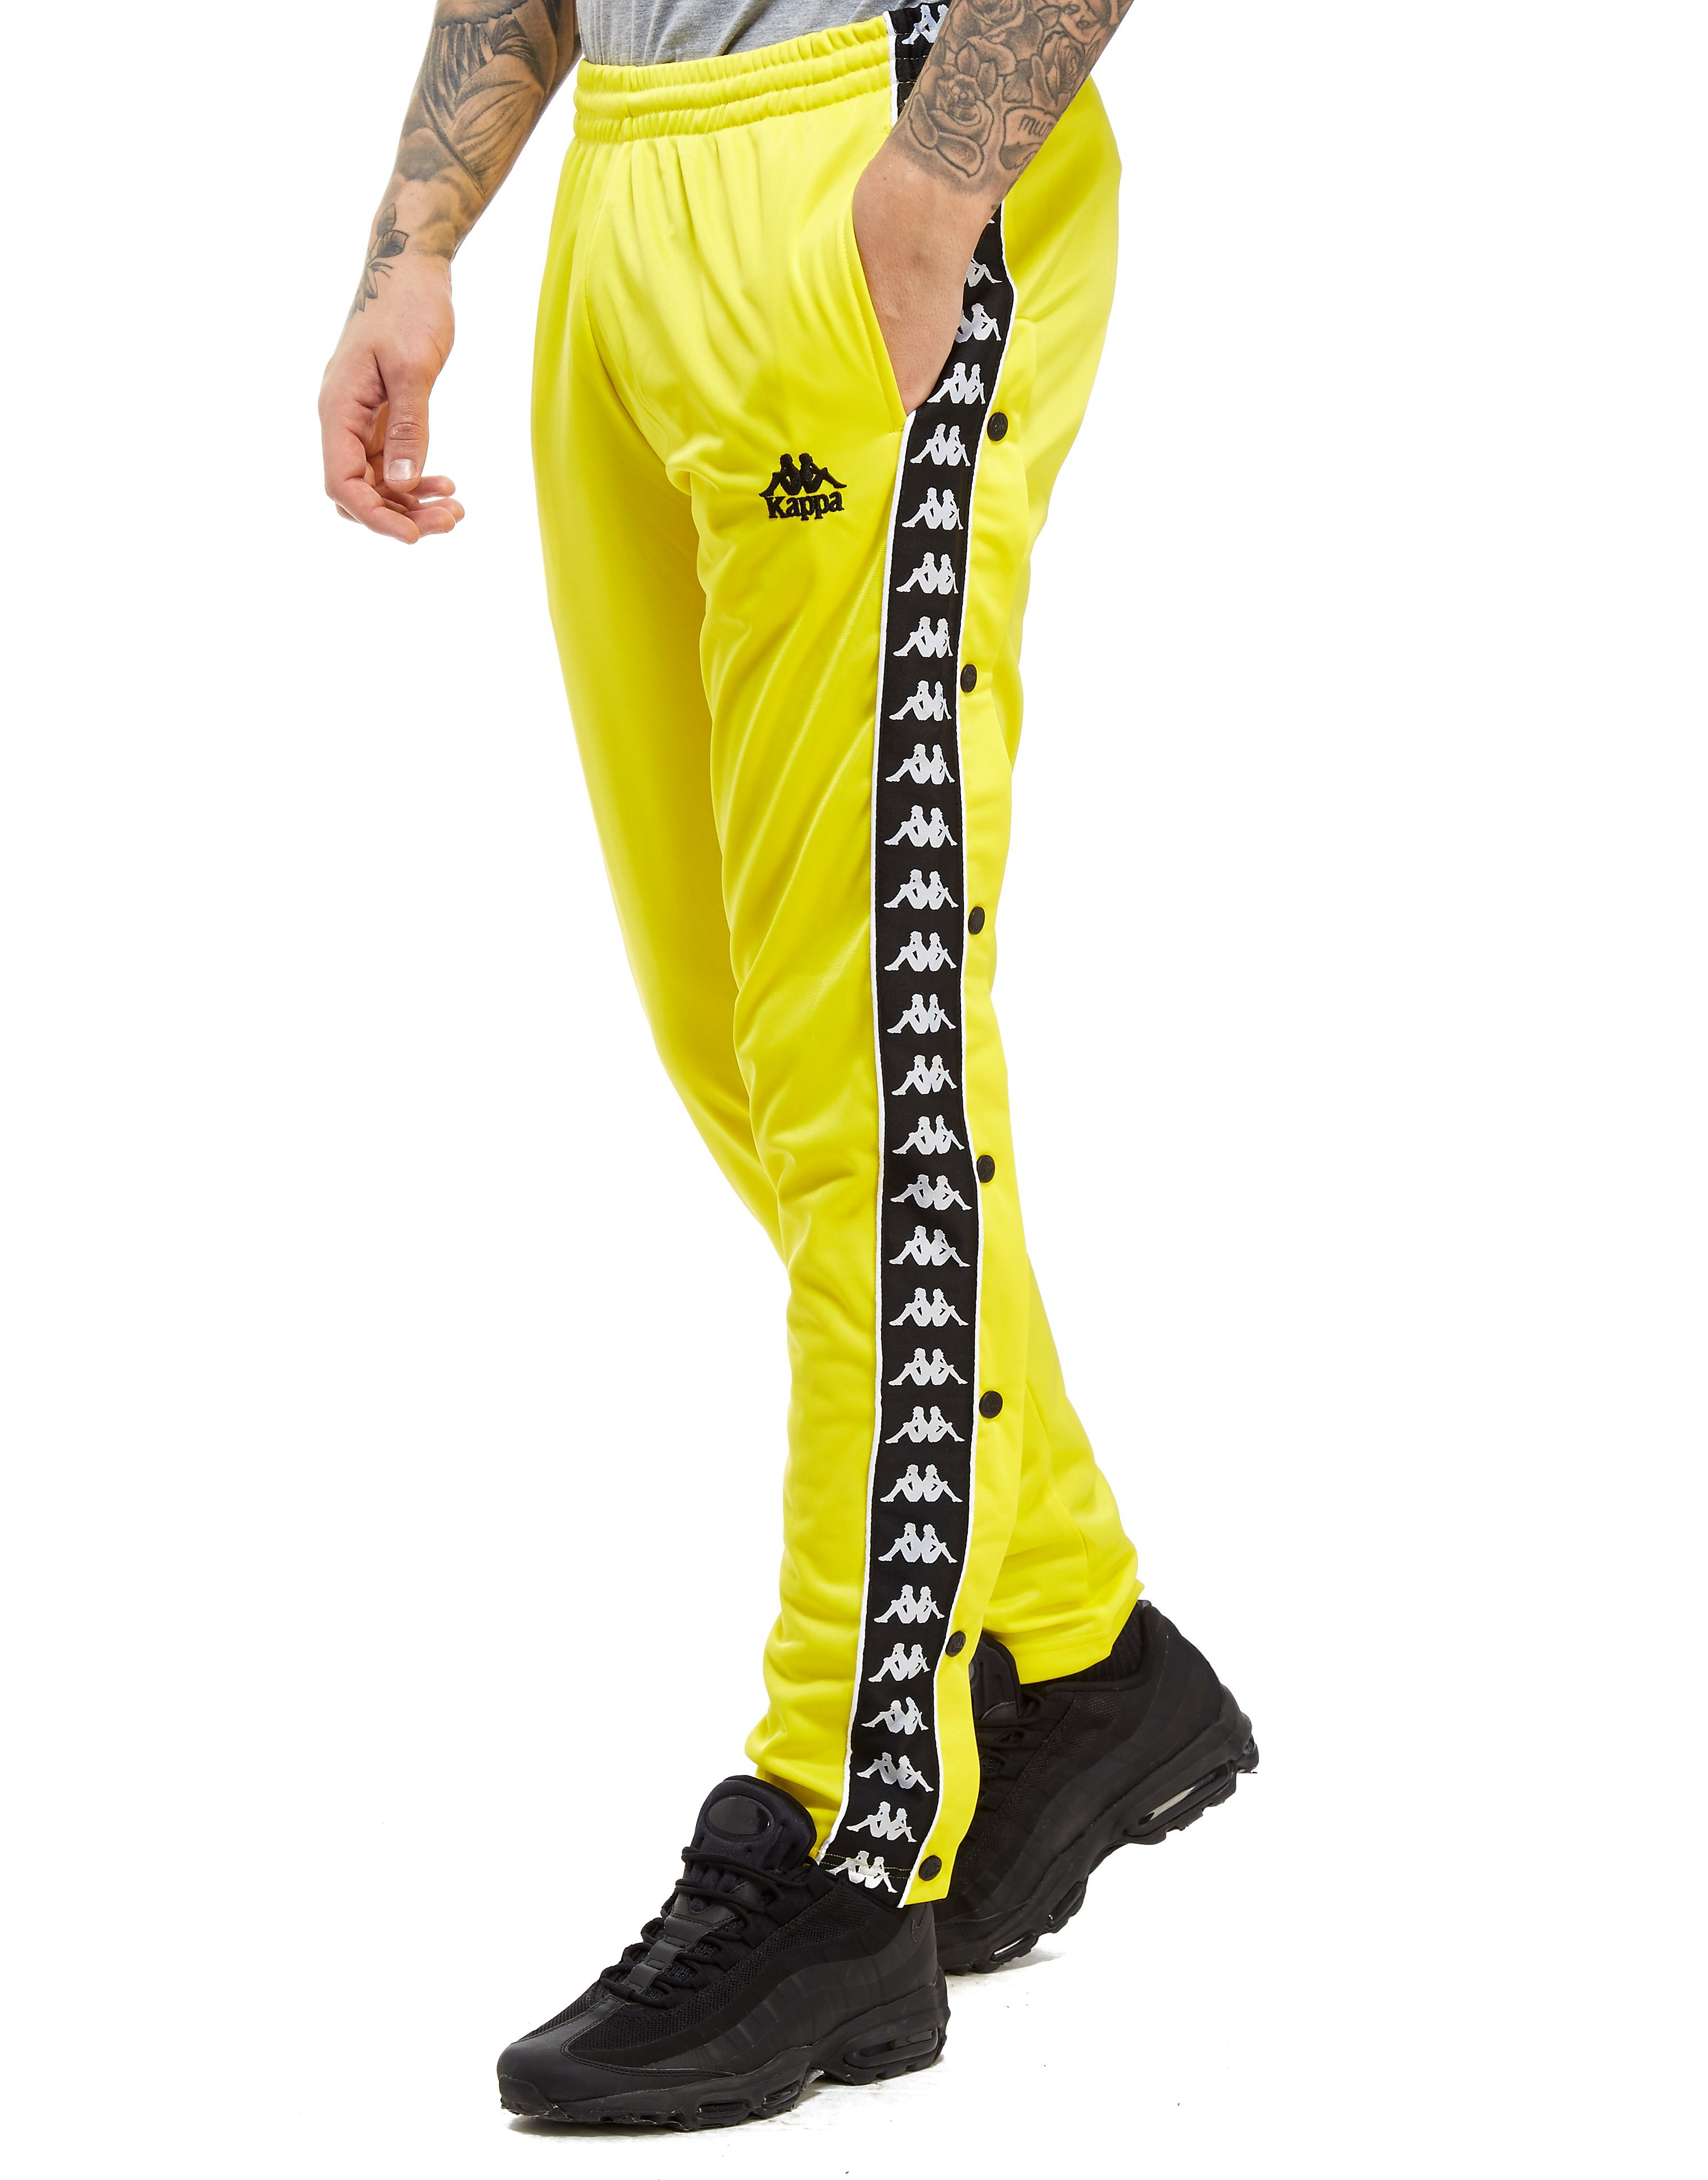 Kappa pantalón de chándal Poppadom